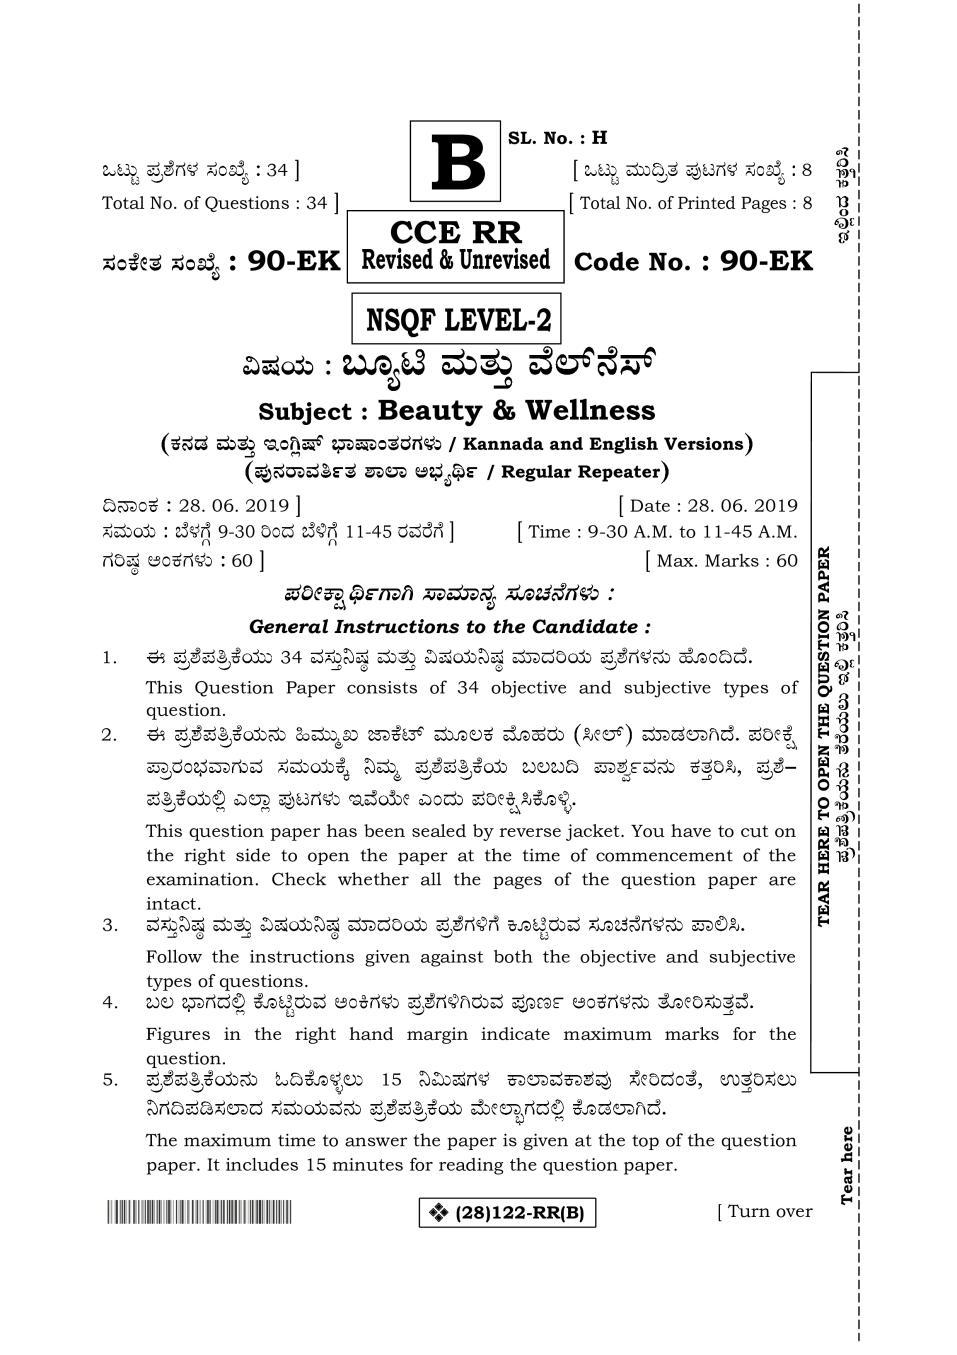 Karnatka SSLC Beauty Wellness Question Paper Jun 2019 - Page 1